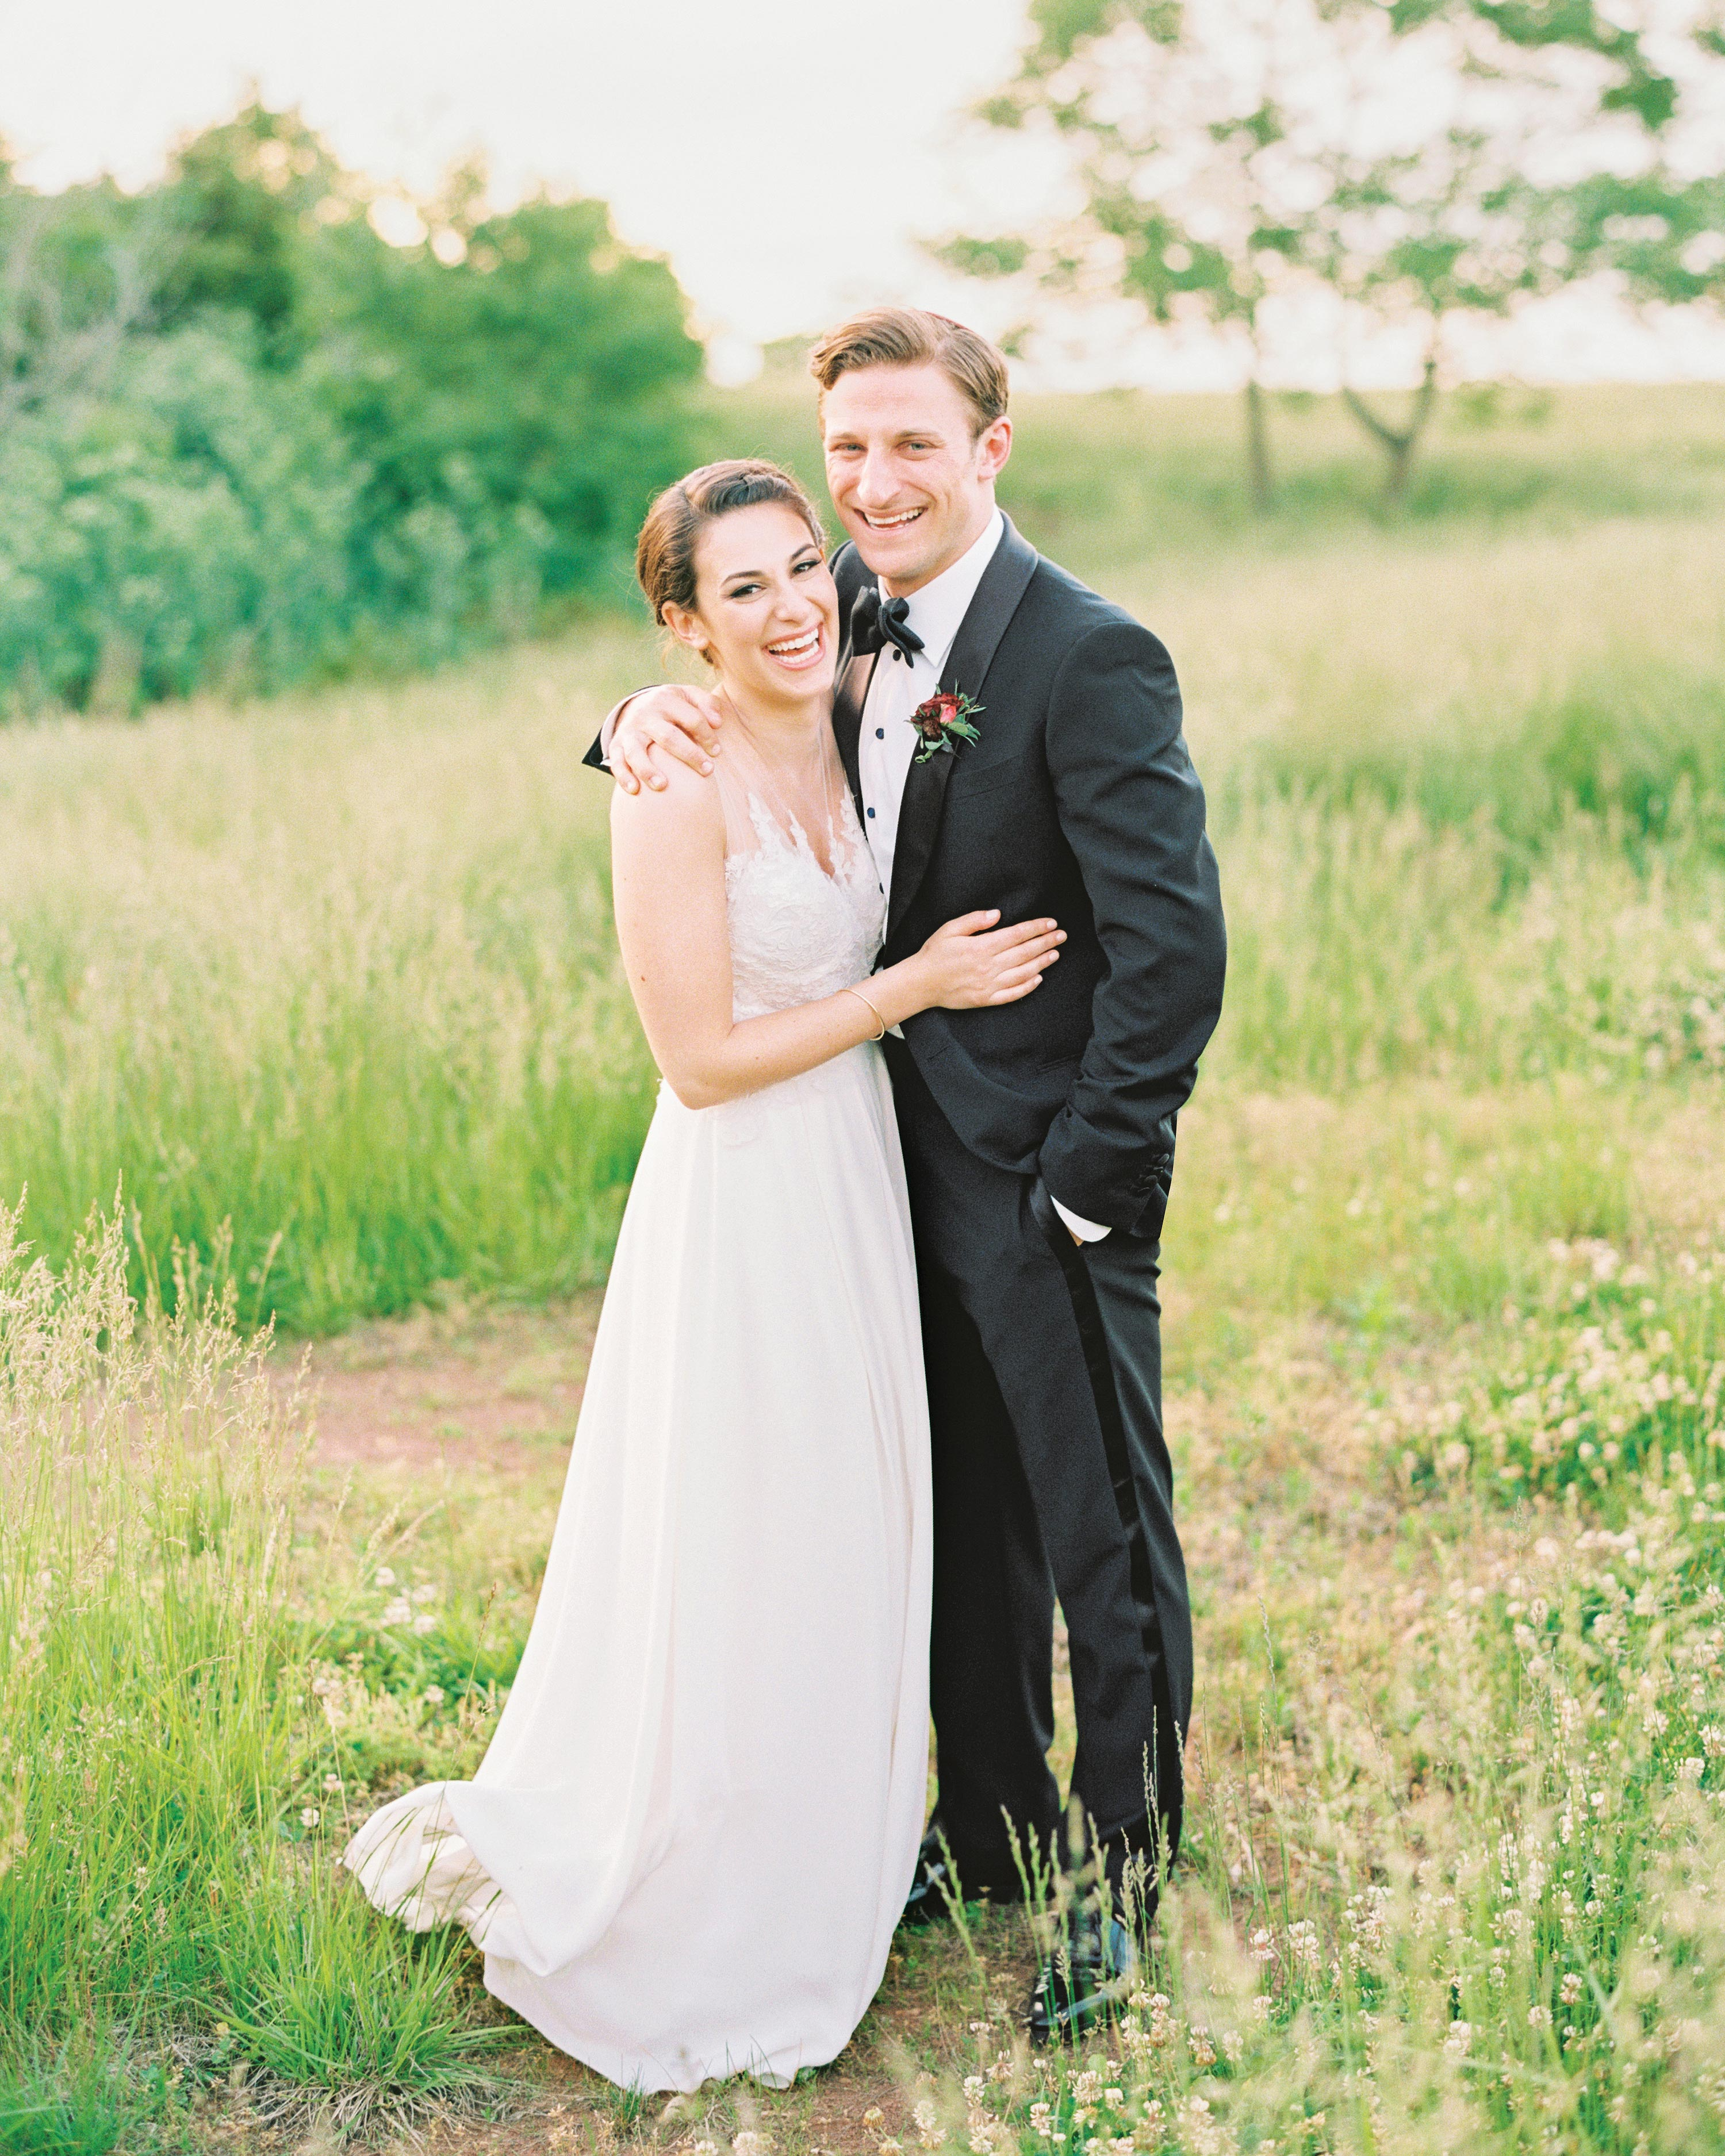 sasha-tyler-wedding-virginia-couple-02-s112867.jpg